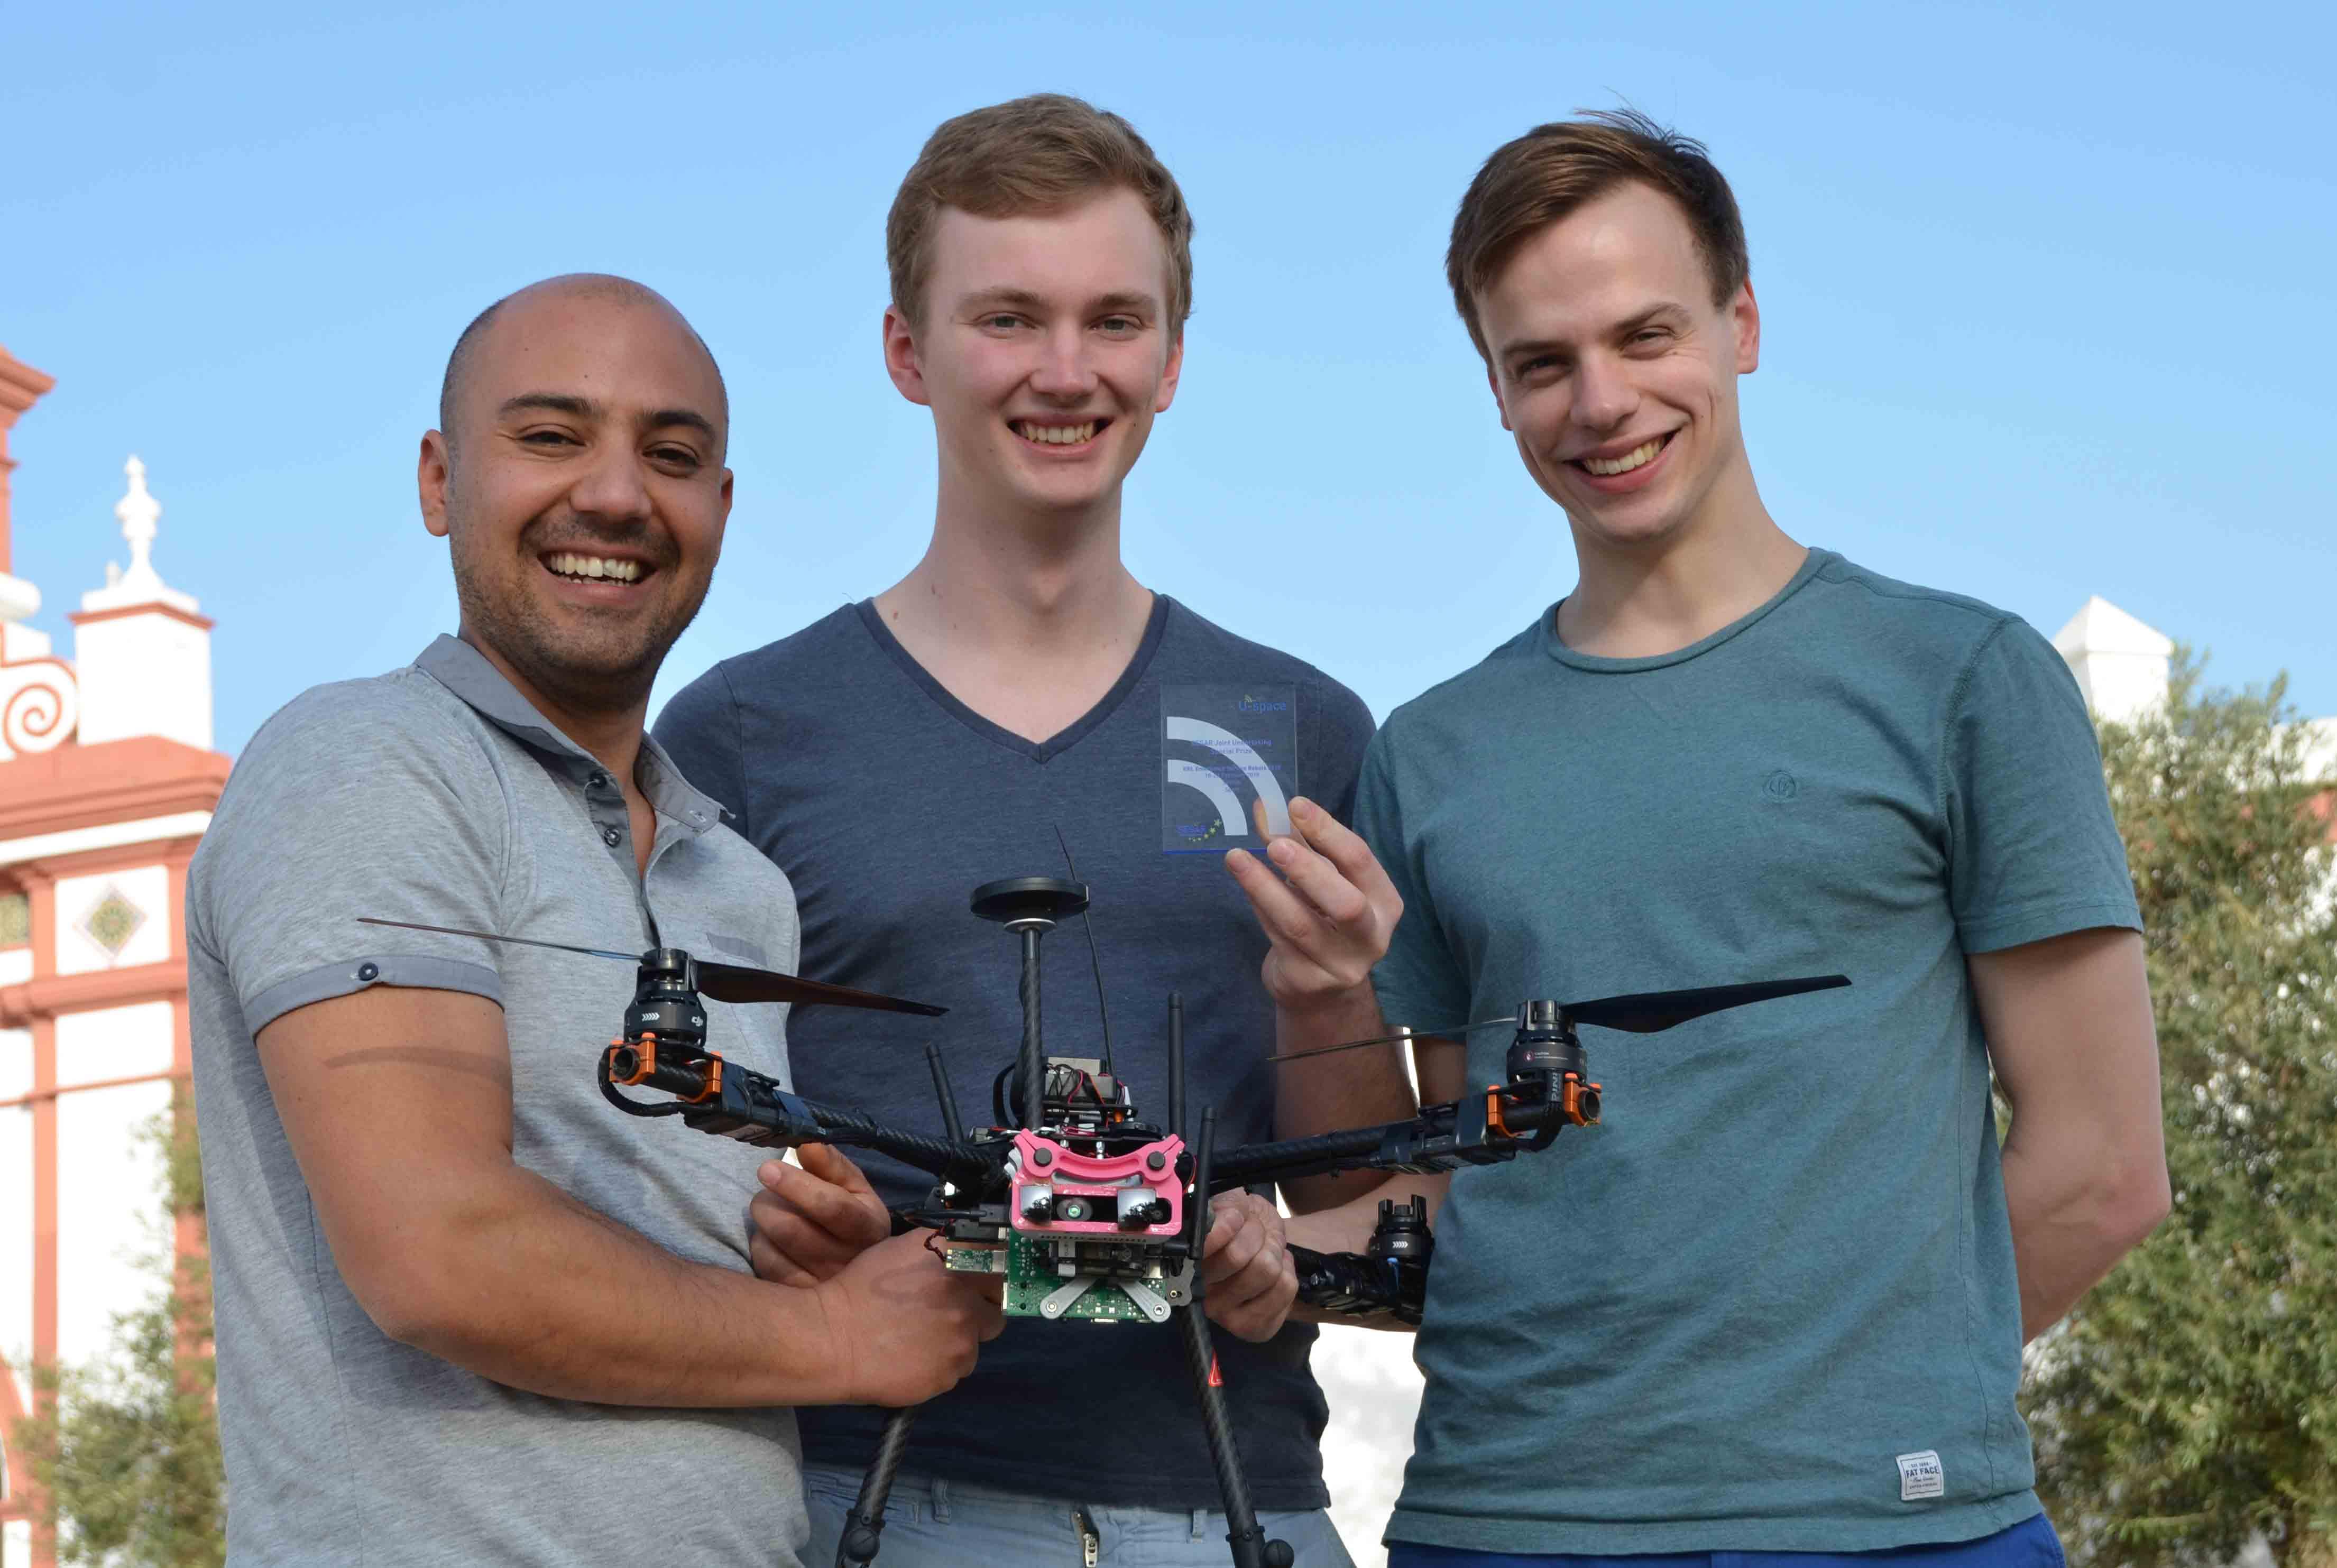 Bath drone squad takes home European robotics prize